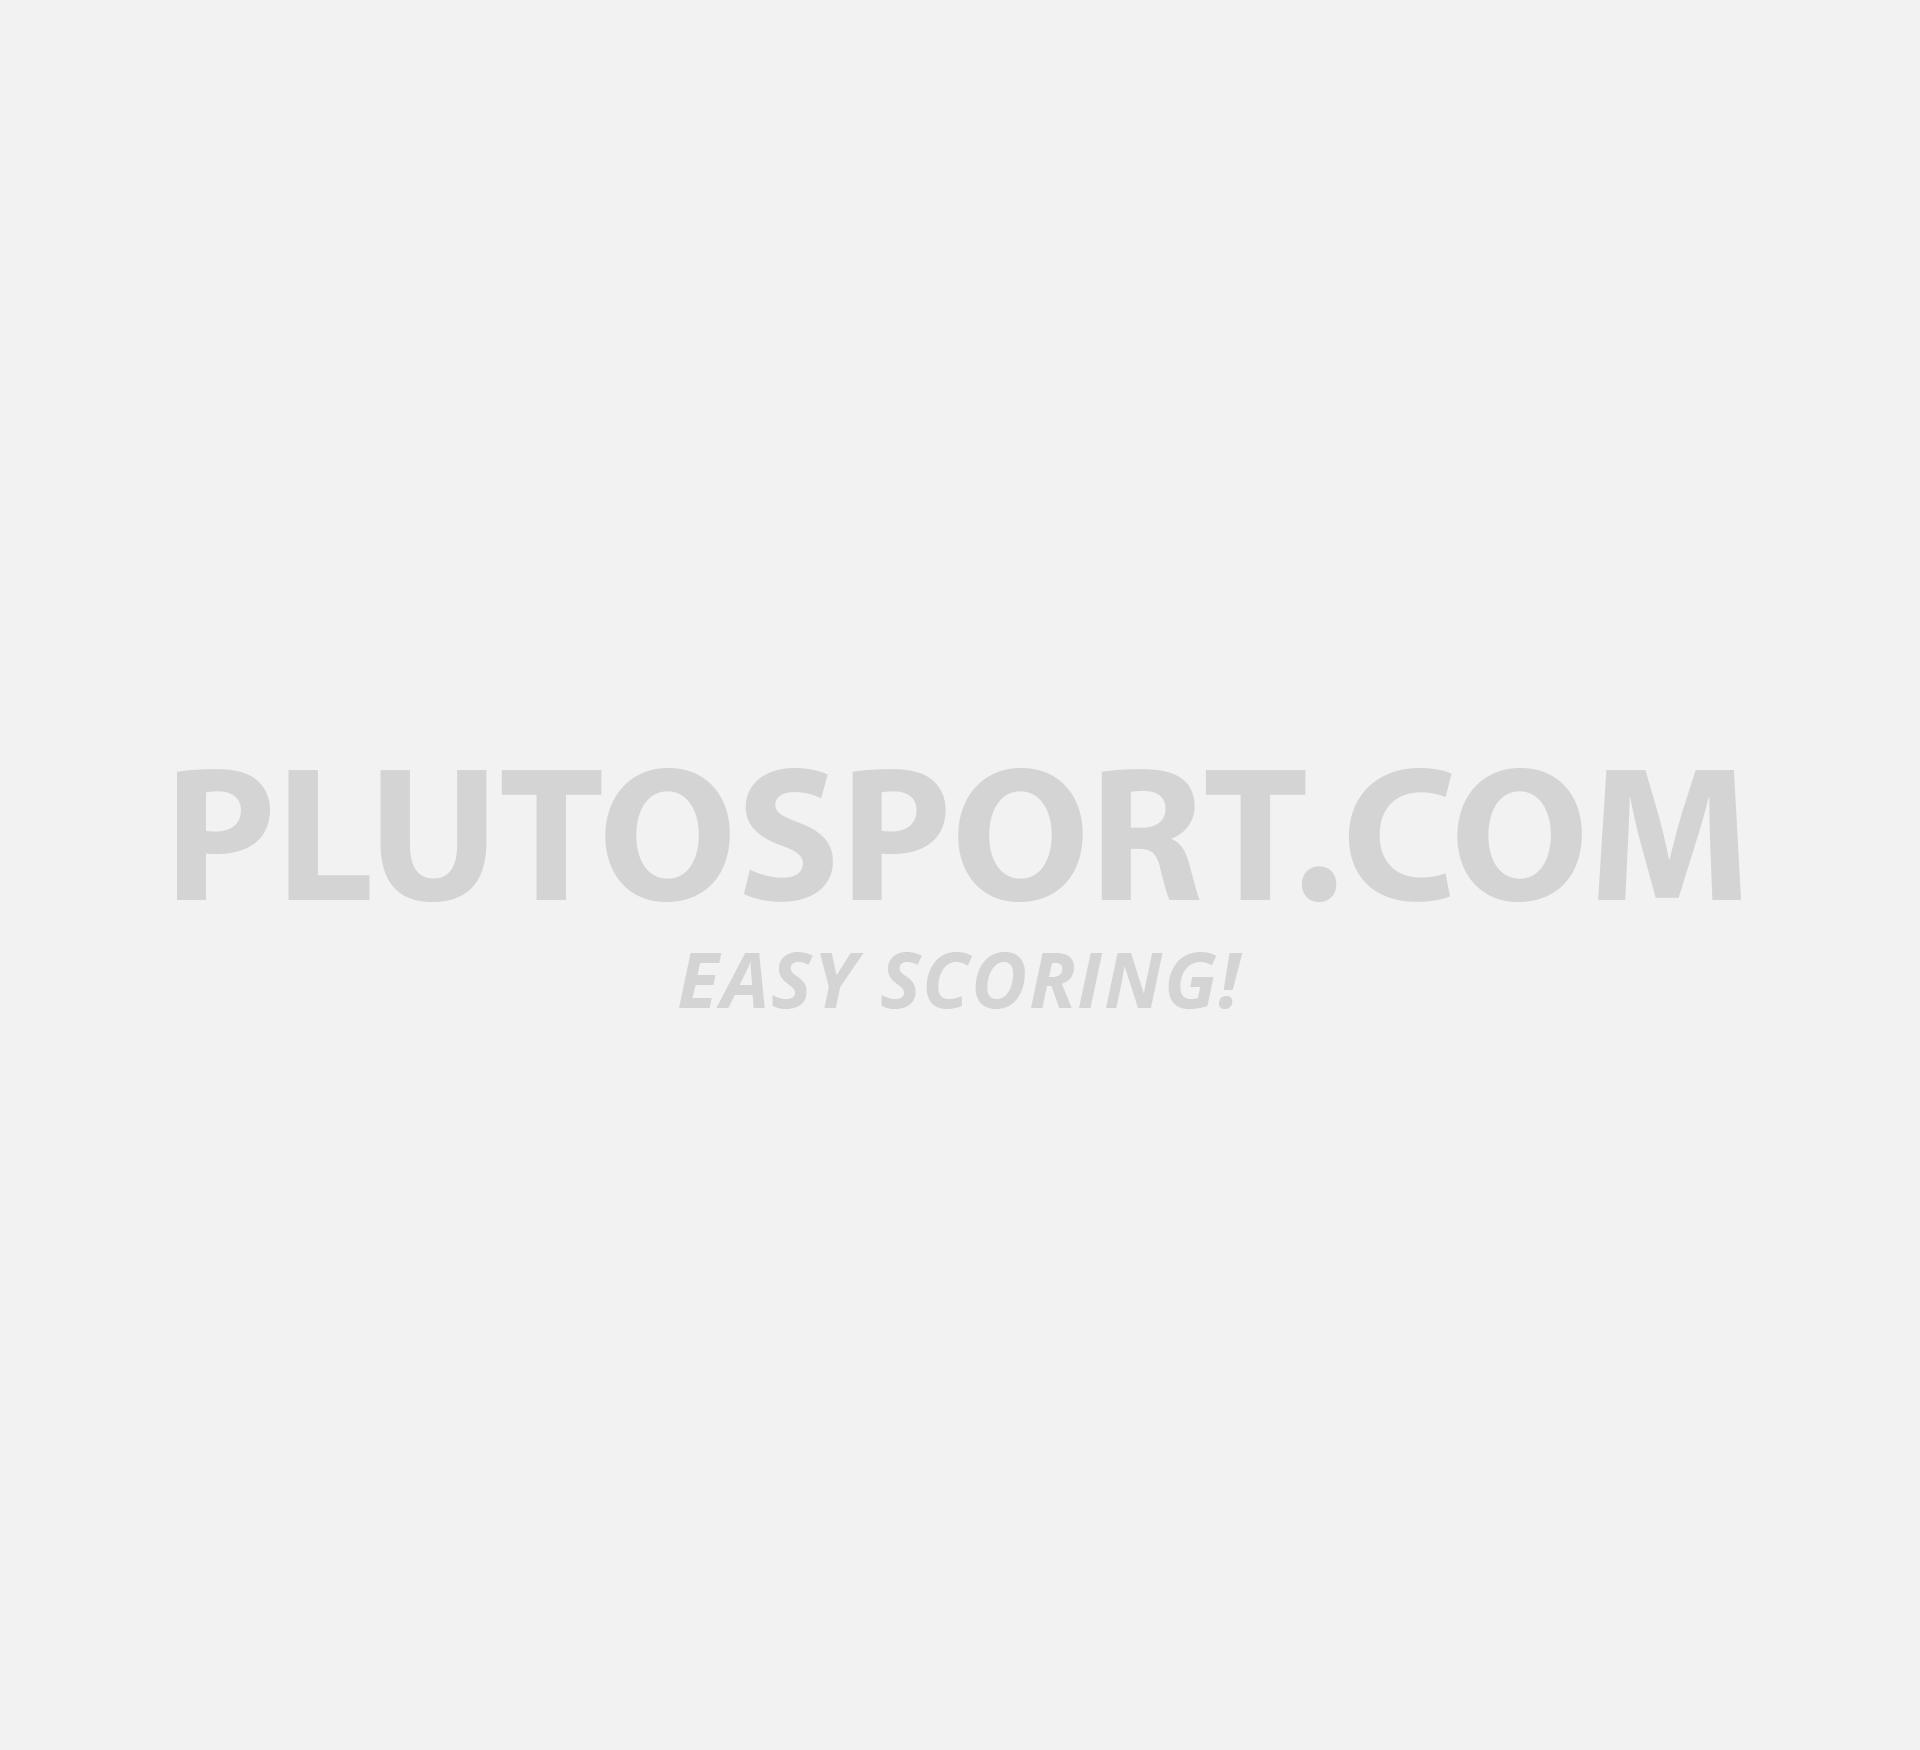 1d4a1f0e4 Nike Hypervenom Phelon III FG - Boots fixed stud - Shoes - Football -  Sports | Plutosport